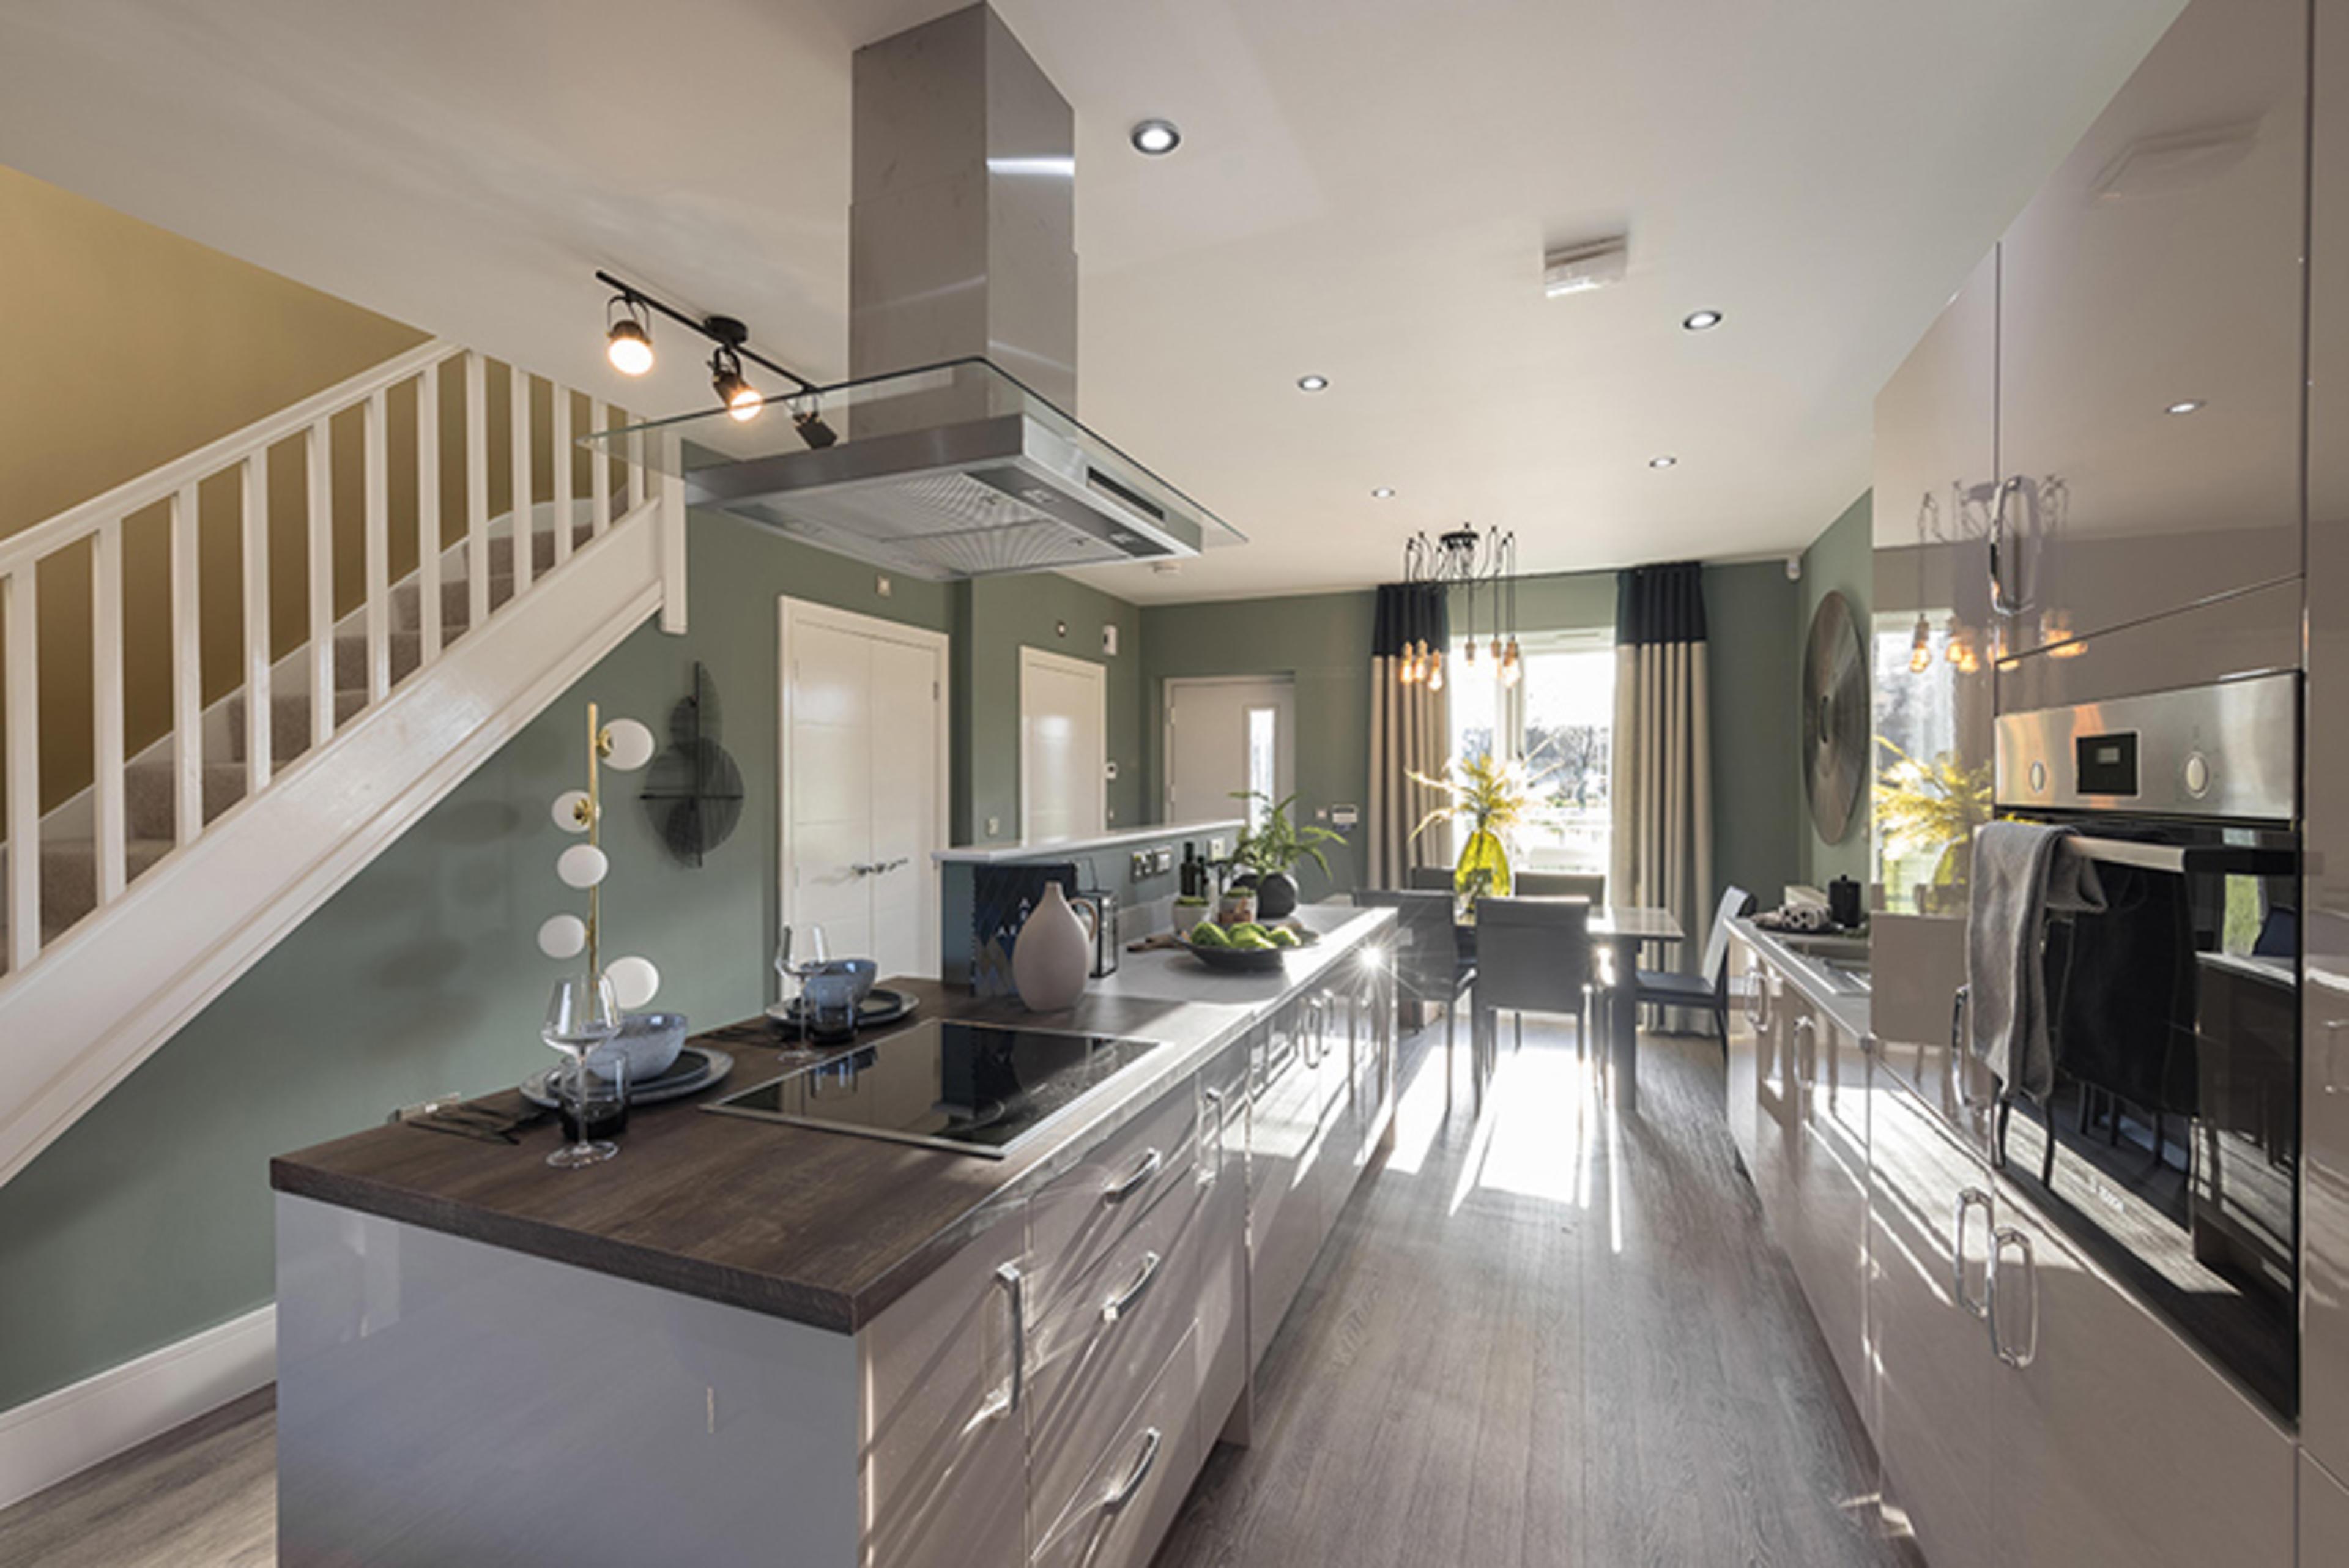 watling-grange-harrogate-easby-3-bed-home-kitchen-3